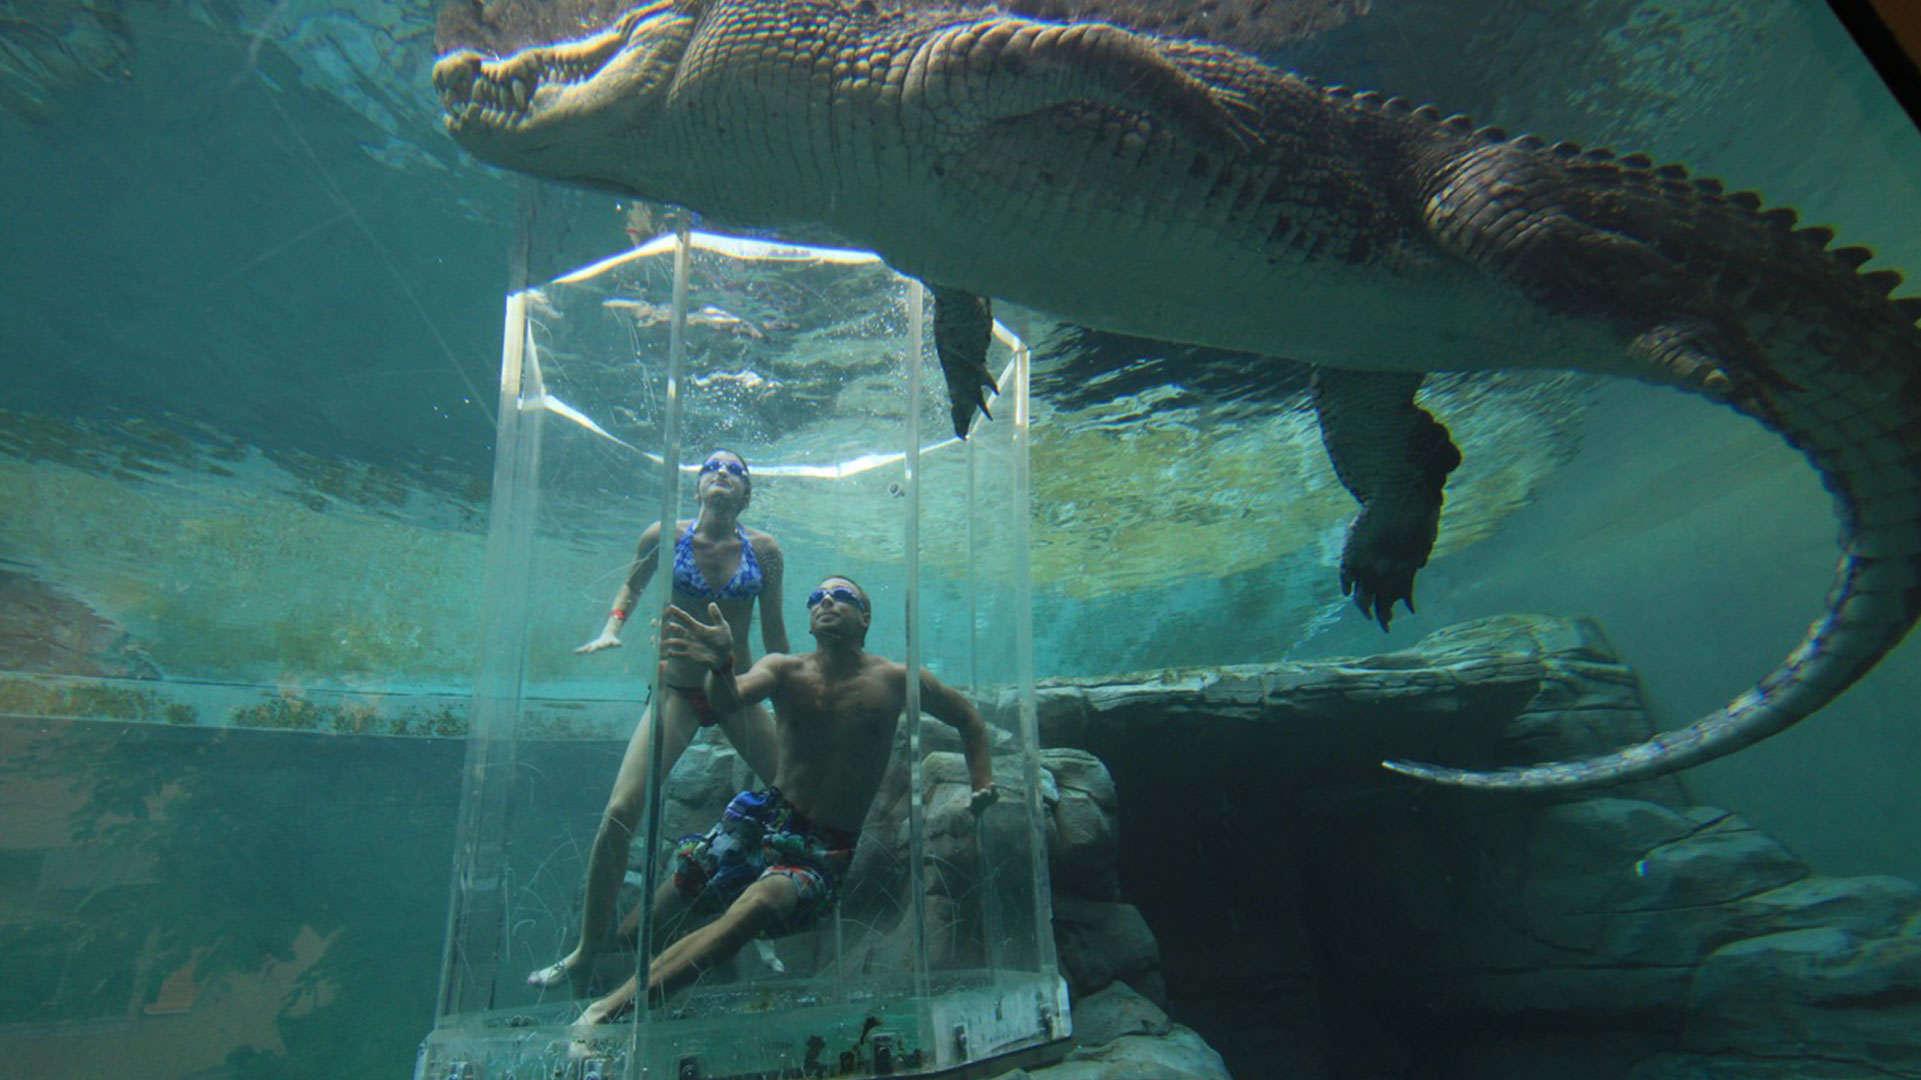 Cage of death crocosaurus cove crocodile park darwin australia